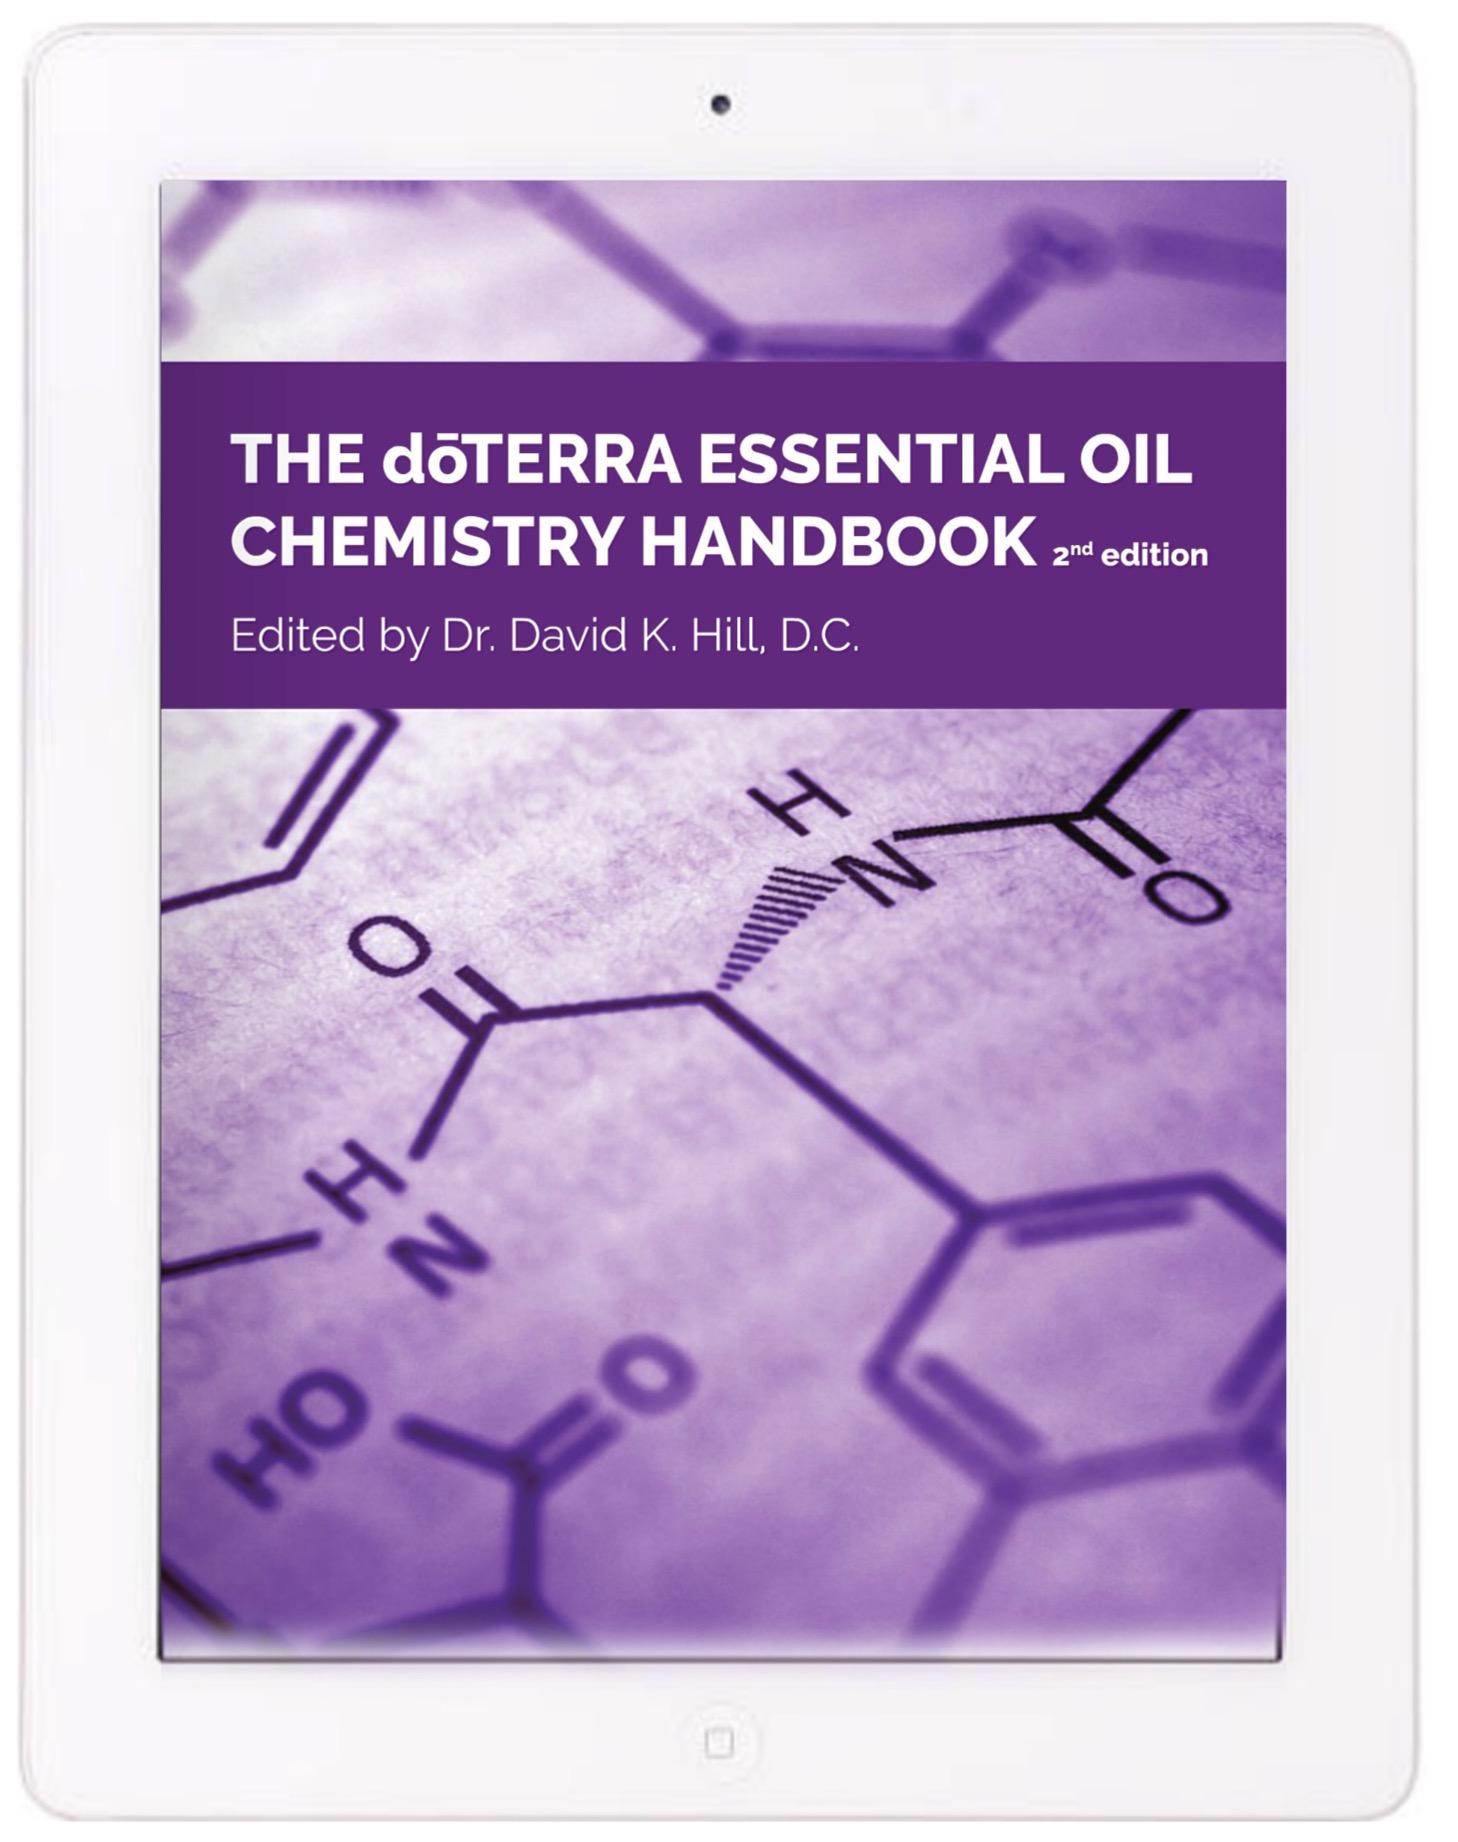 doTERRA Chemistry Book